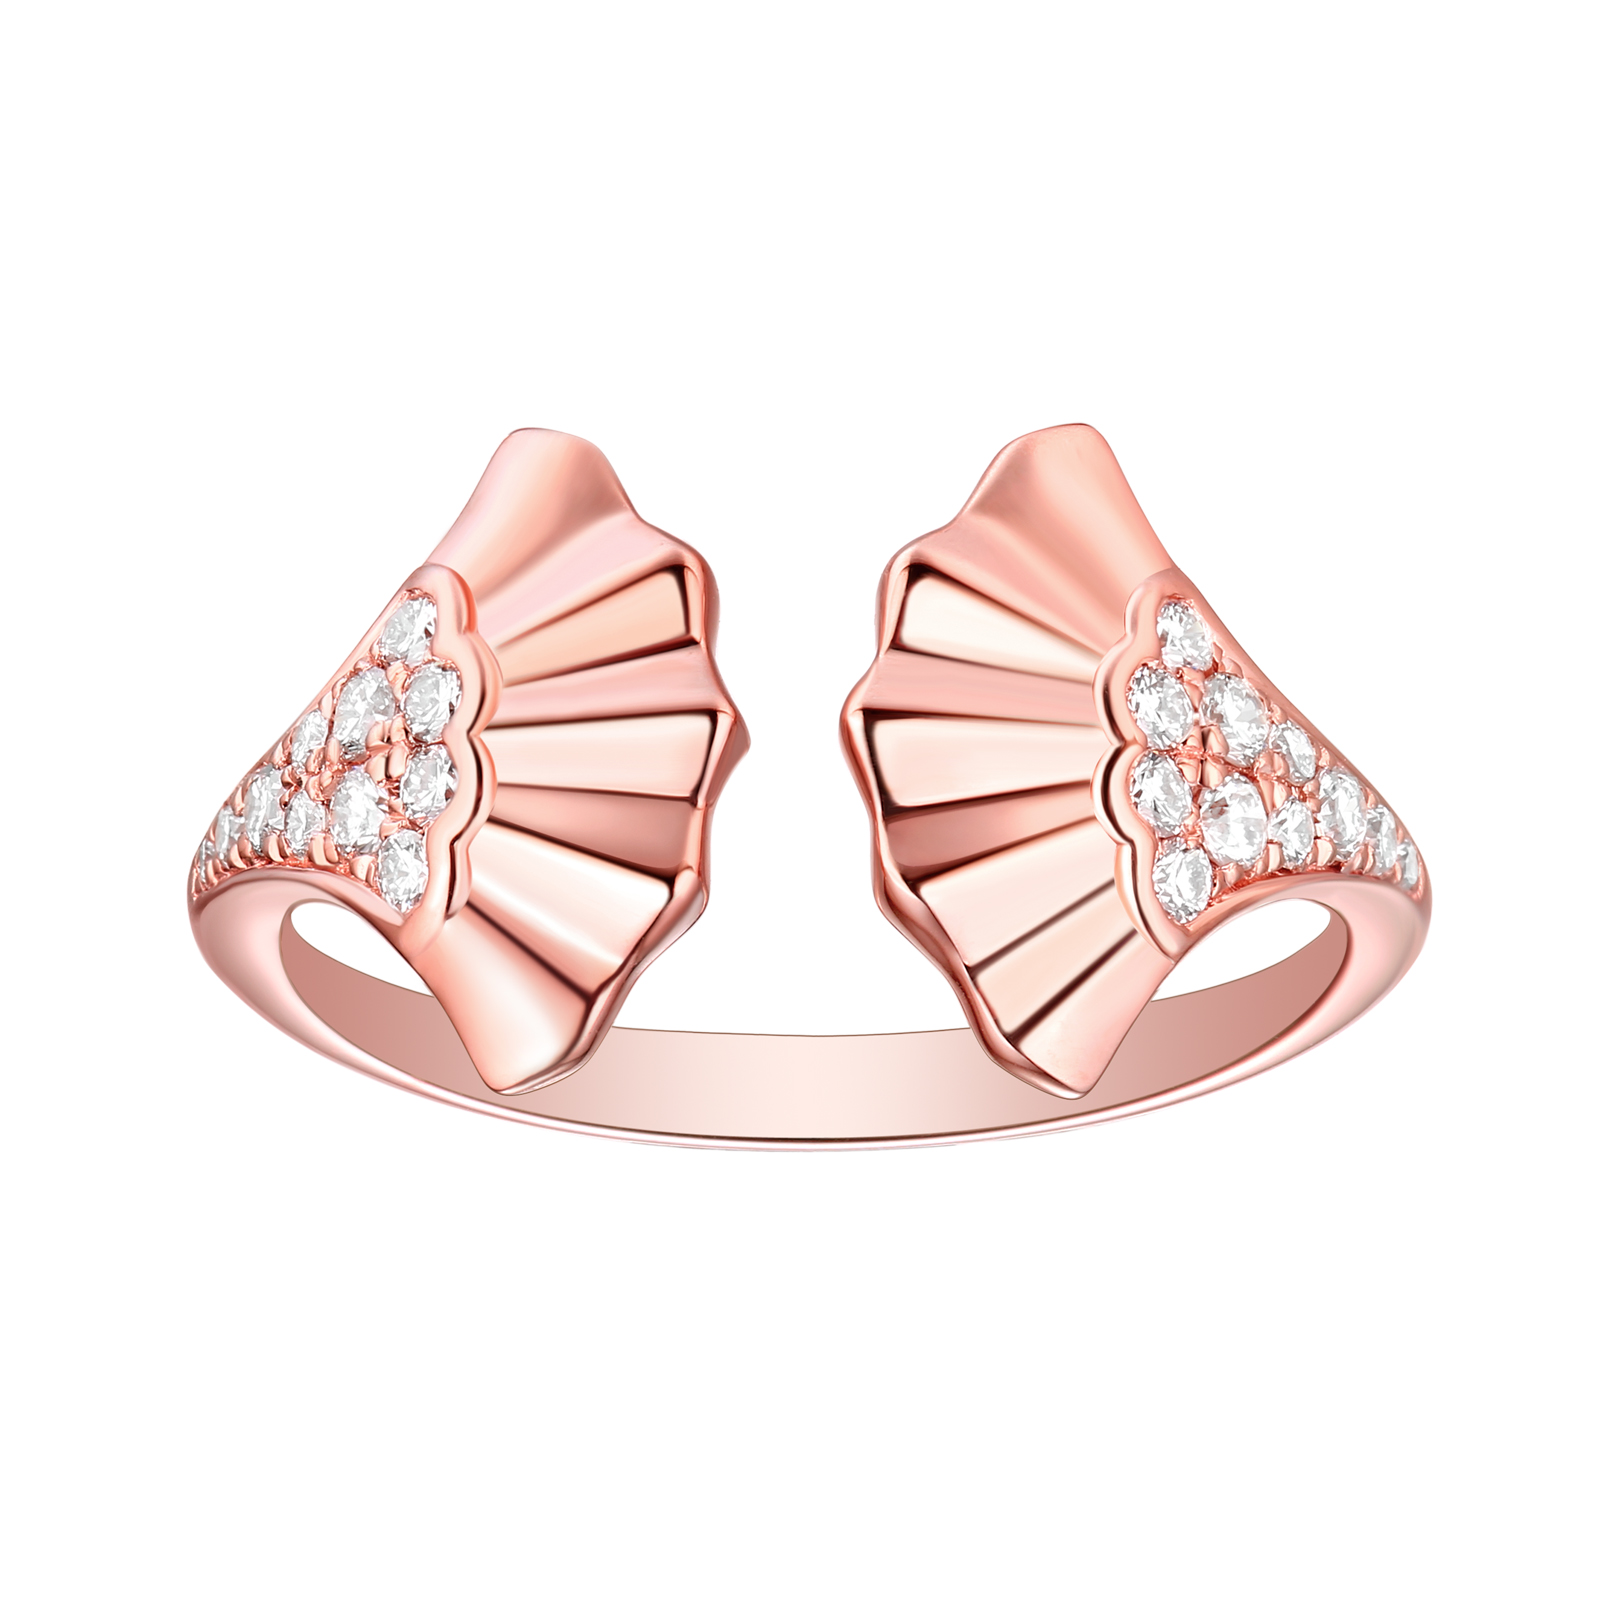 R29922WHT- 14K Rose Gold Diamond Ring, 0.25 TCW